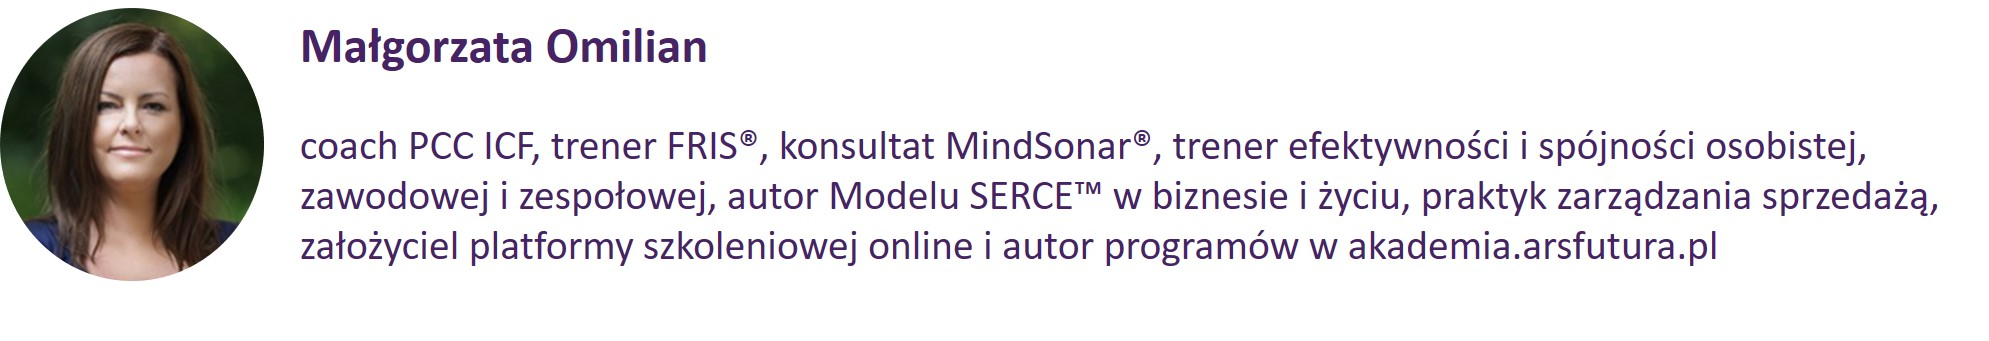 Małgorzata Omilian :: akademia.arsfutura.pl